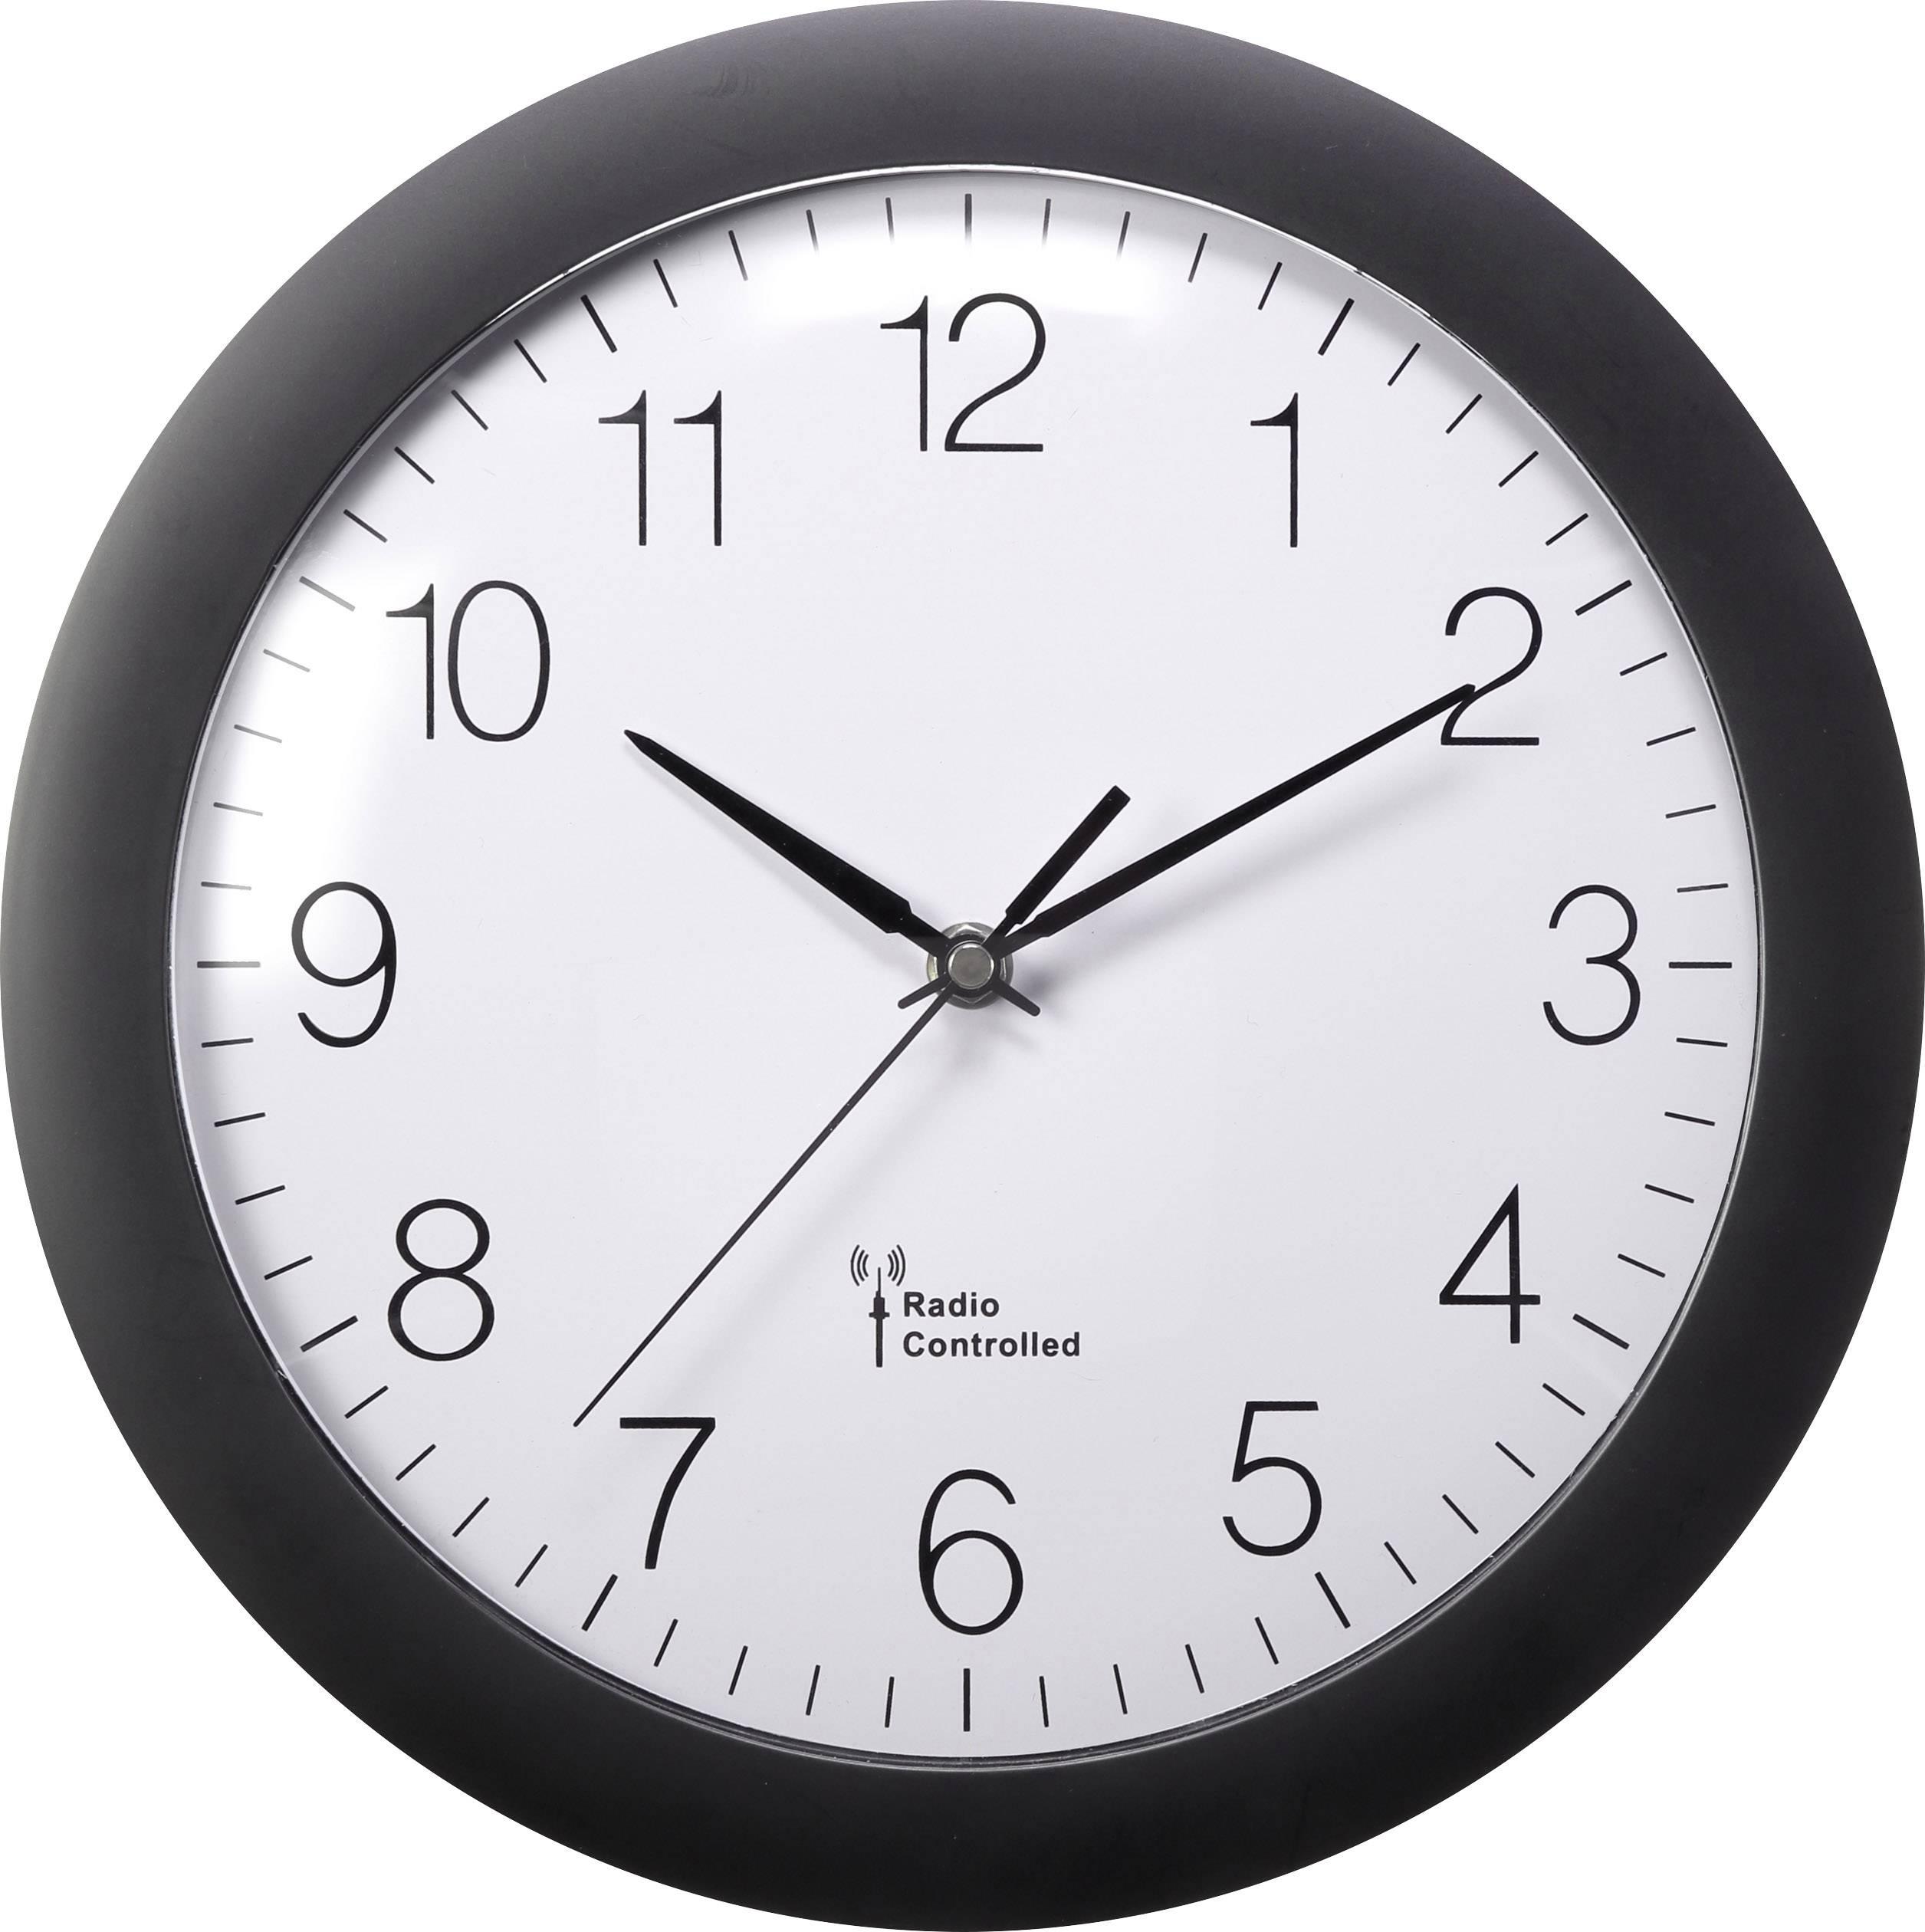 DCF nástenné hodiny Basetech vonkajší Ø 300 mm, čierna